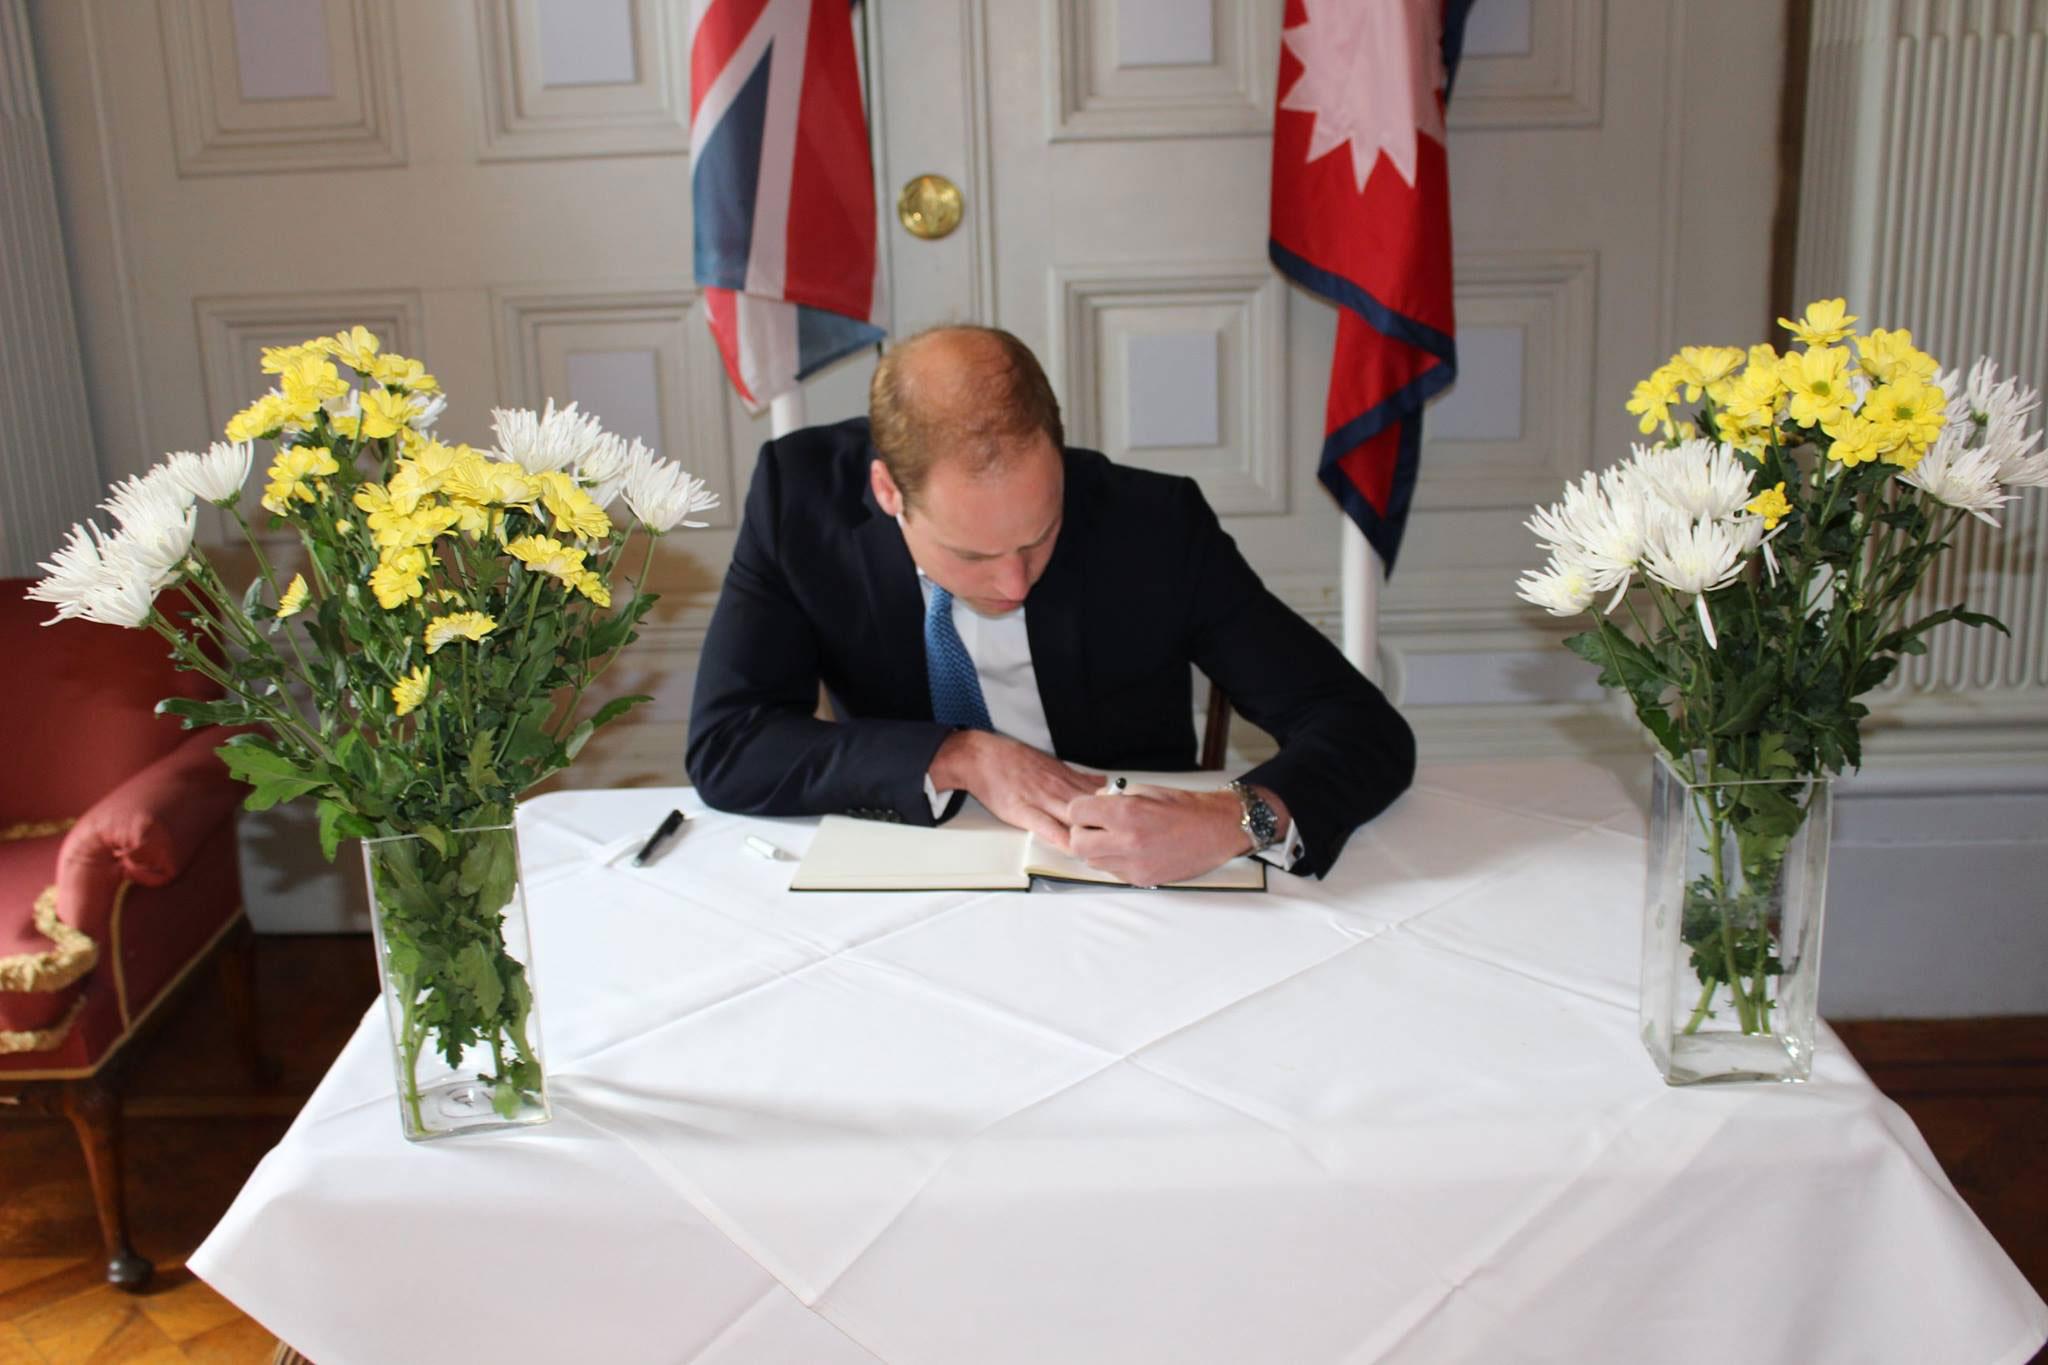 Prince-William-Nepal-Embassy-London-2